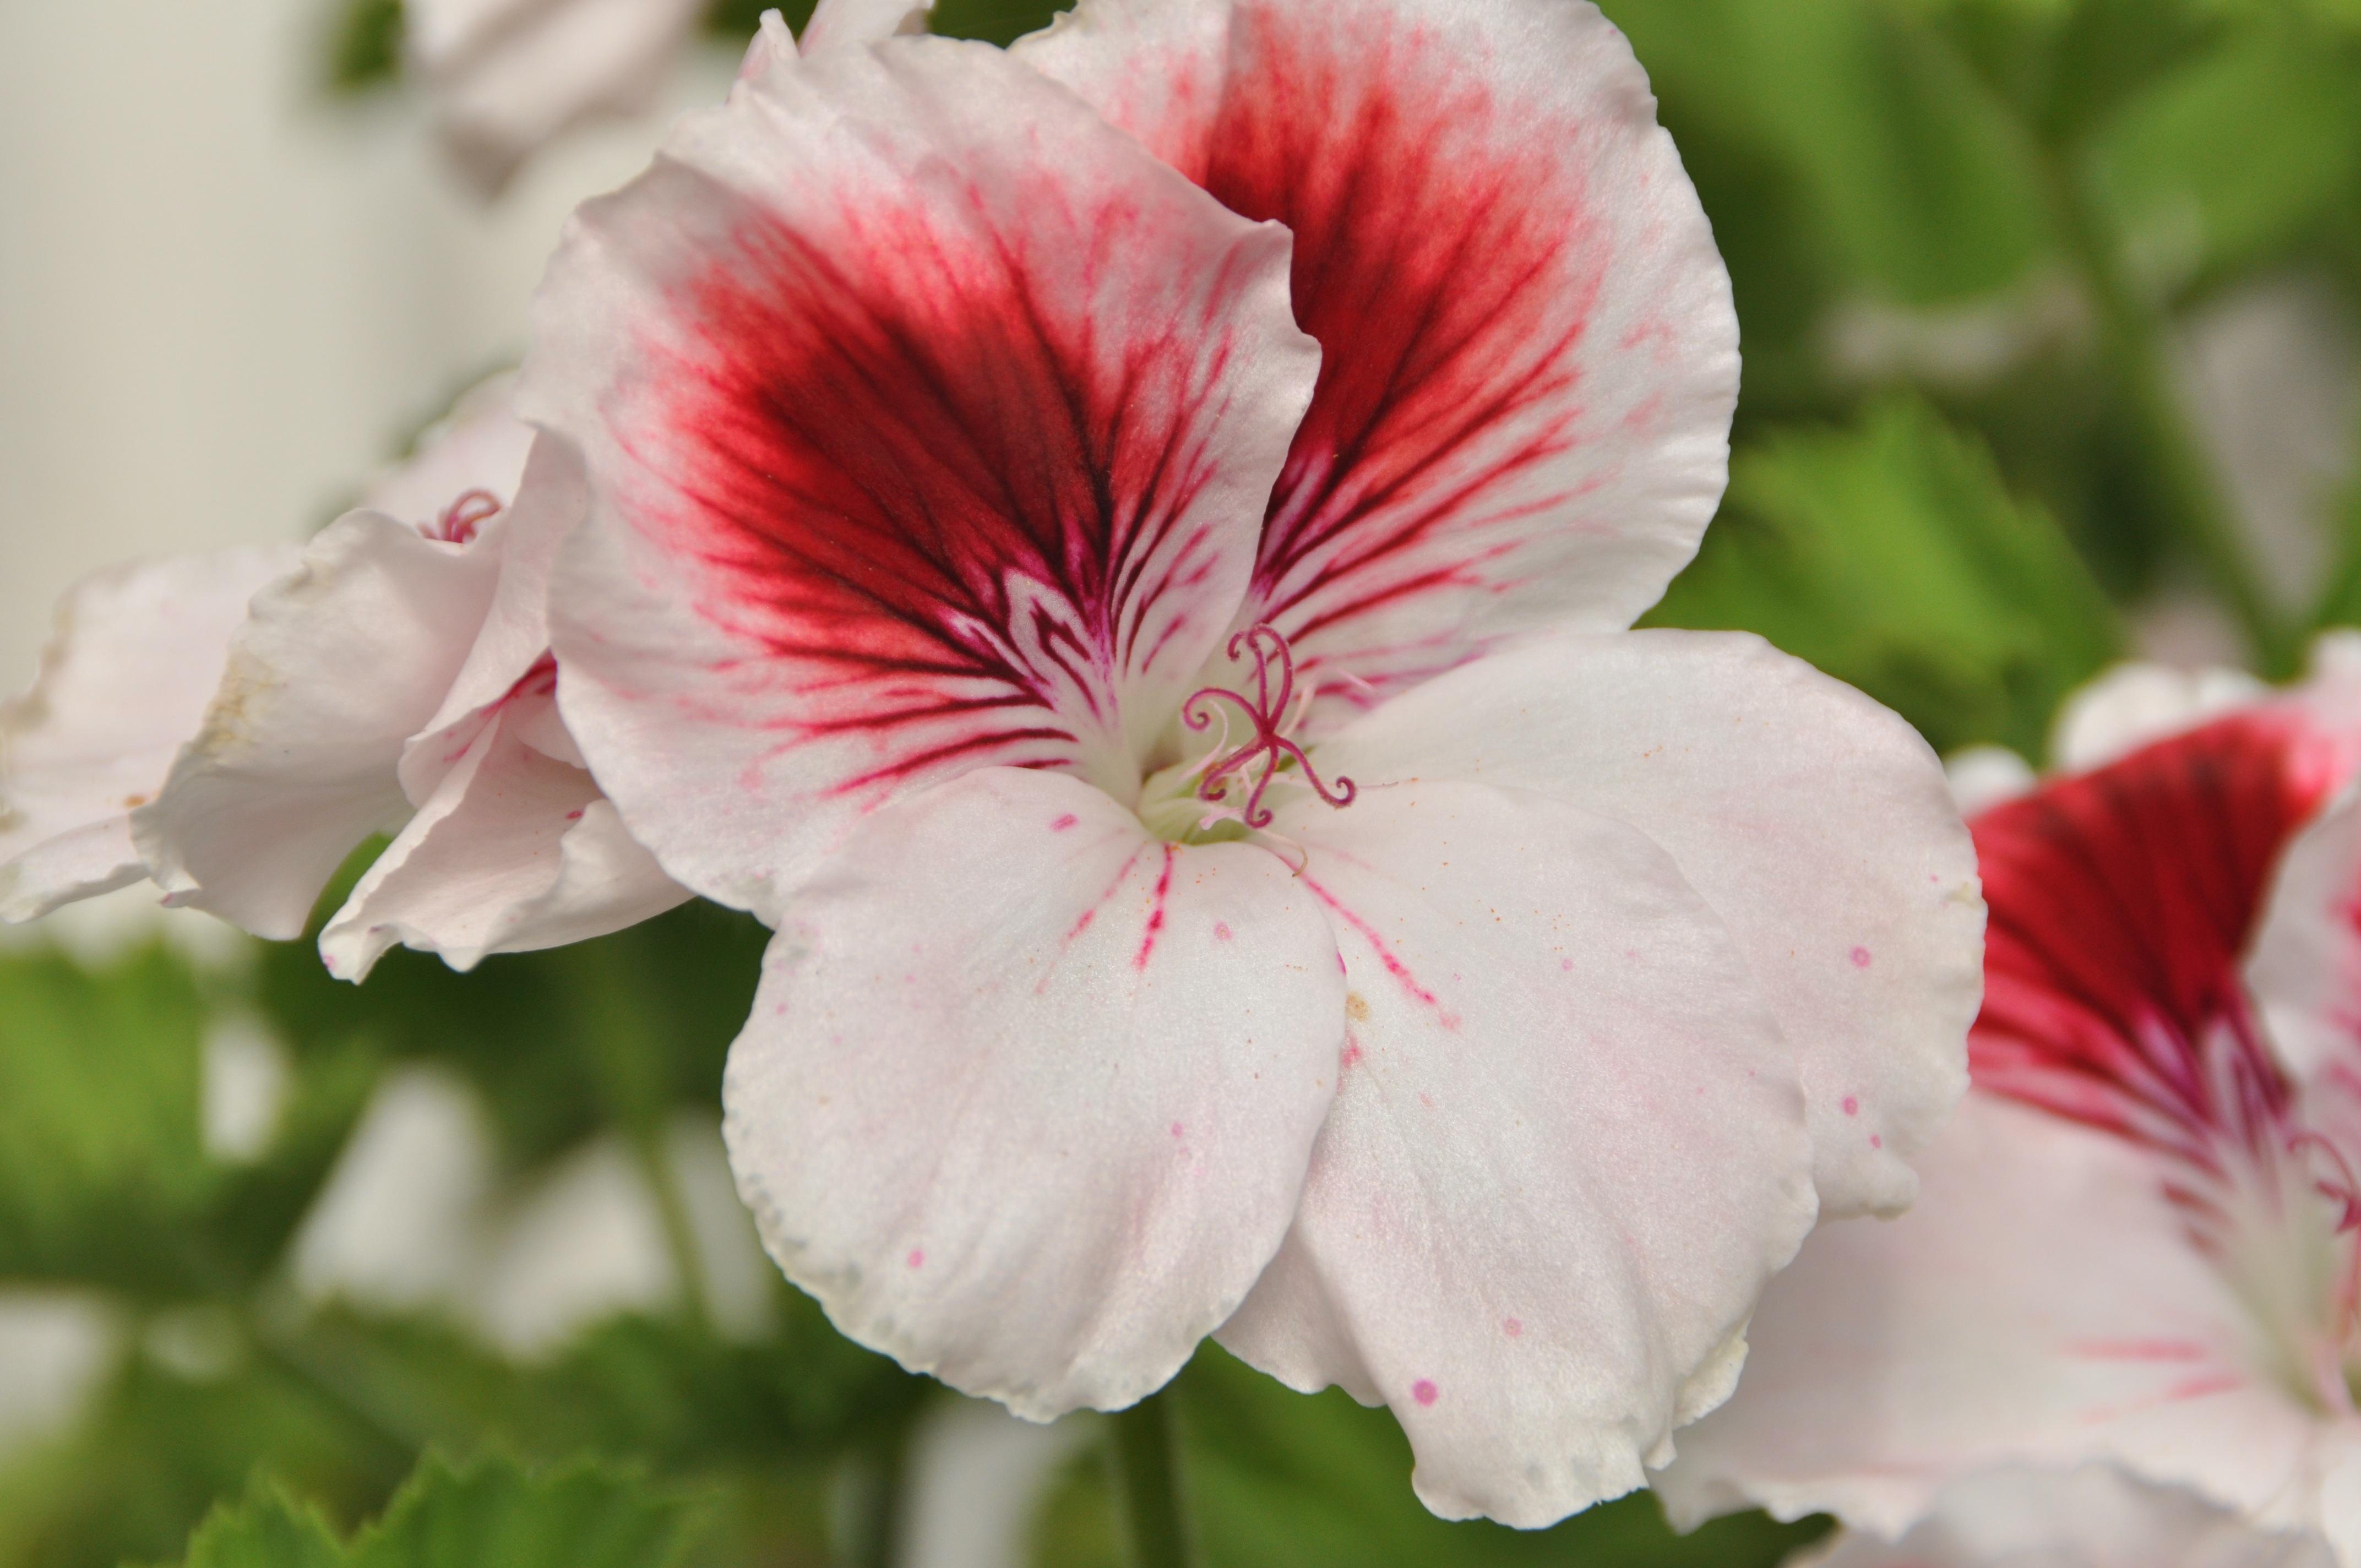 Free Images Nature Blossom Petal Bloom Summer Flora Geranium